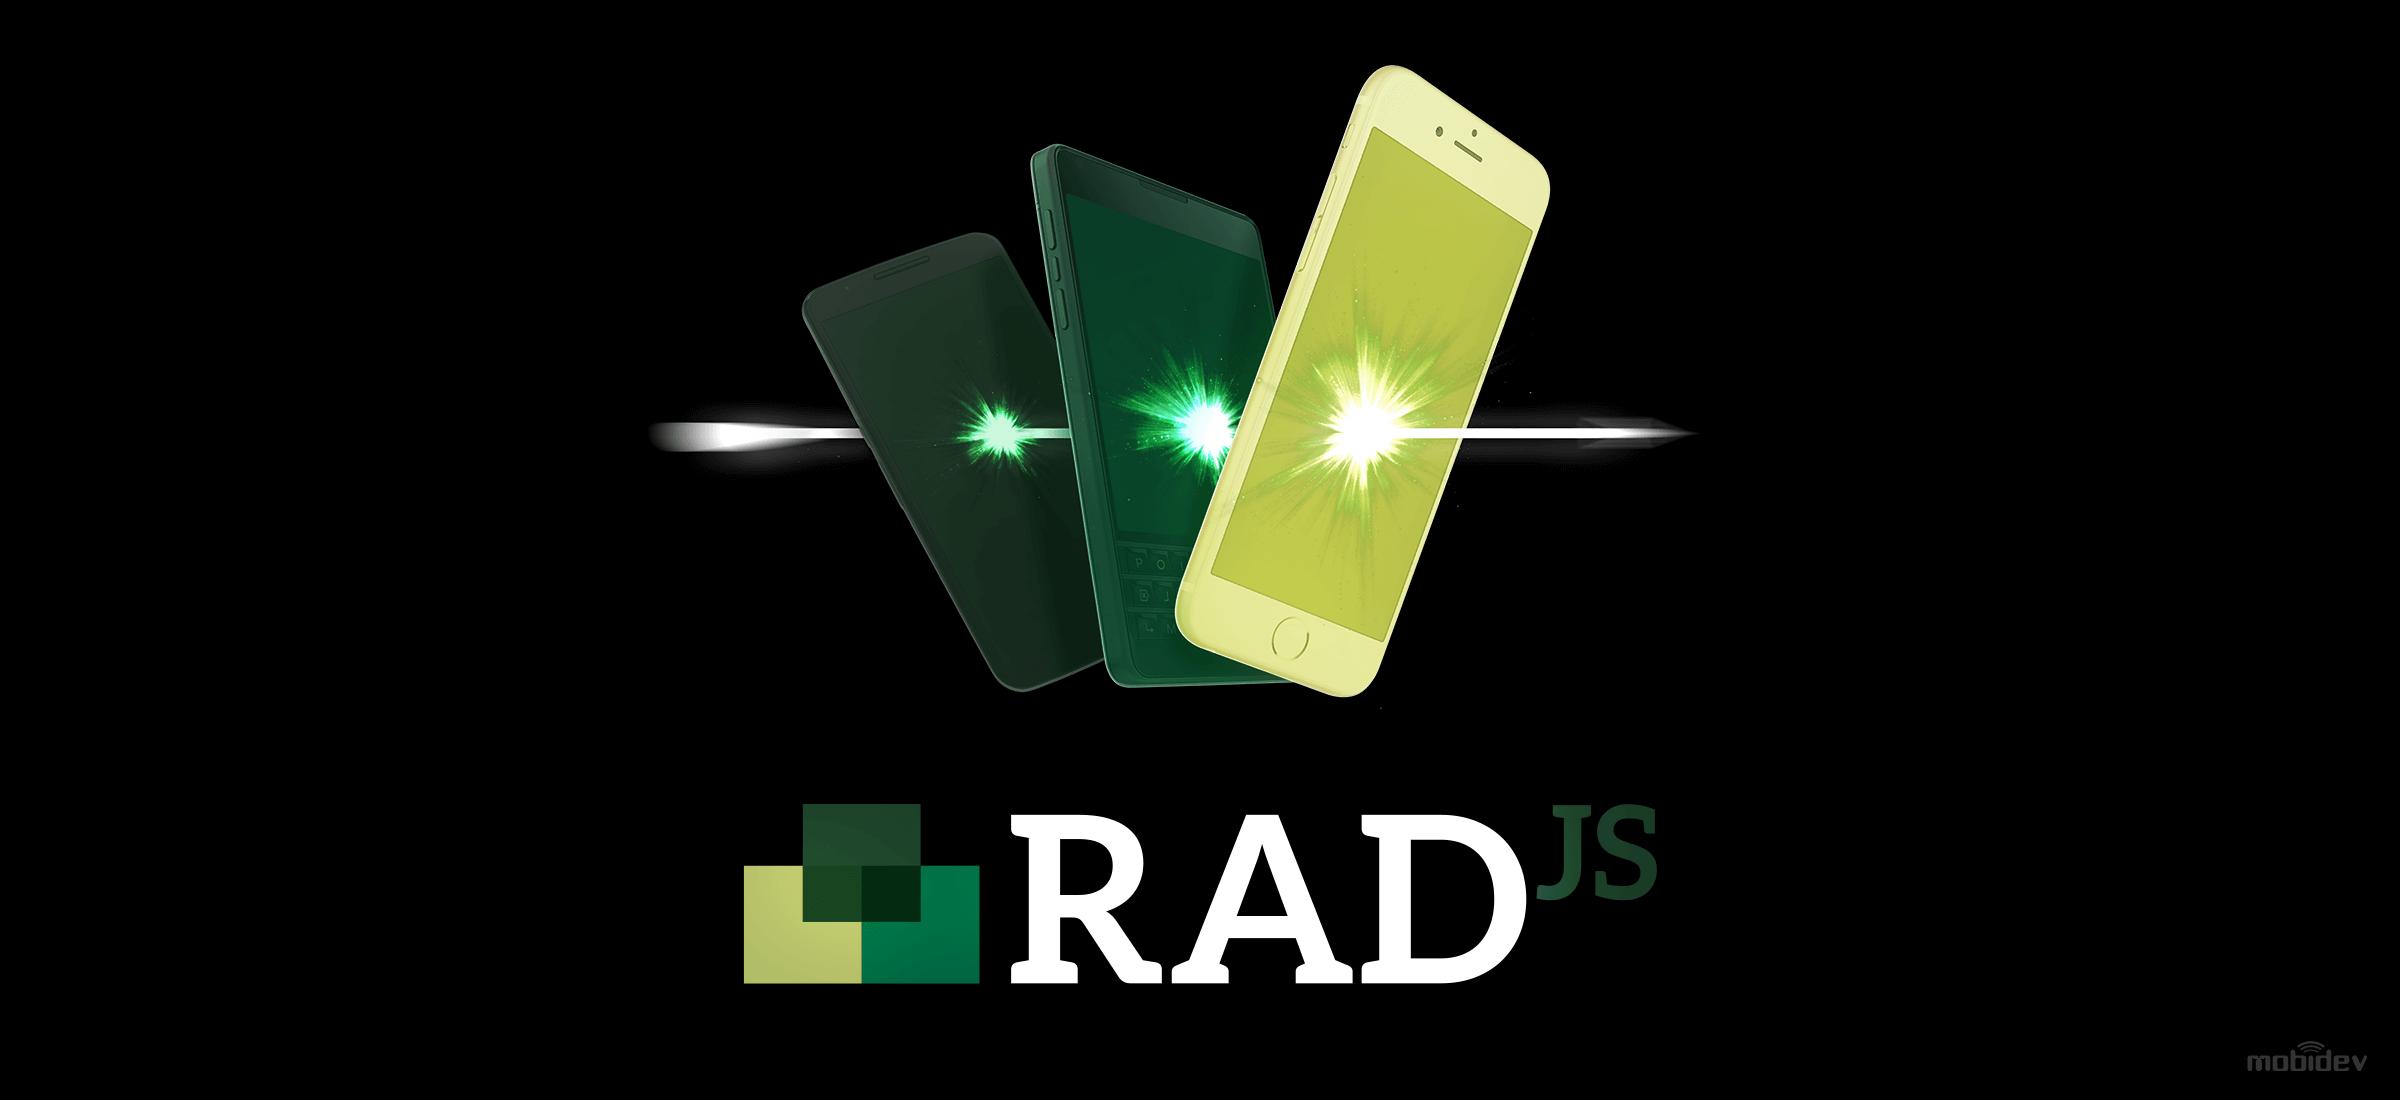 RAD.js – A Breakthrough In Cross-Platform